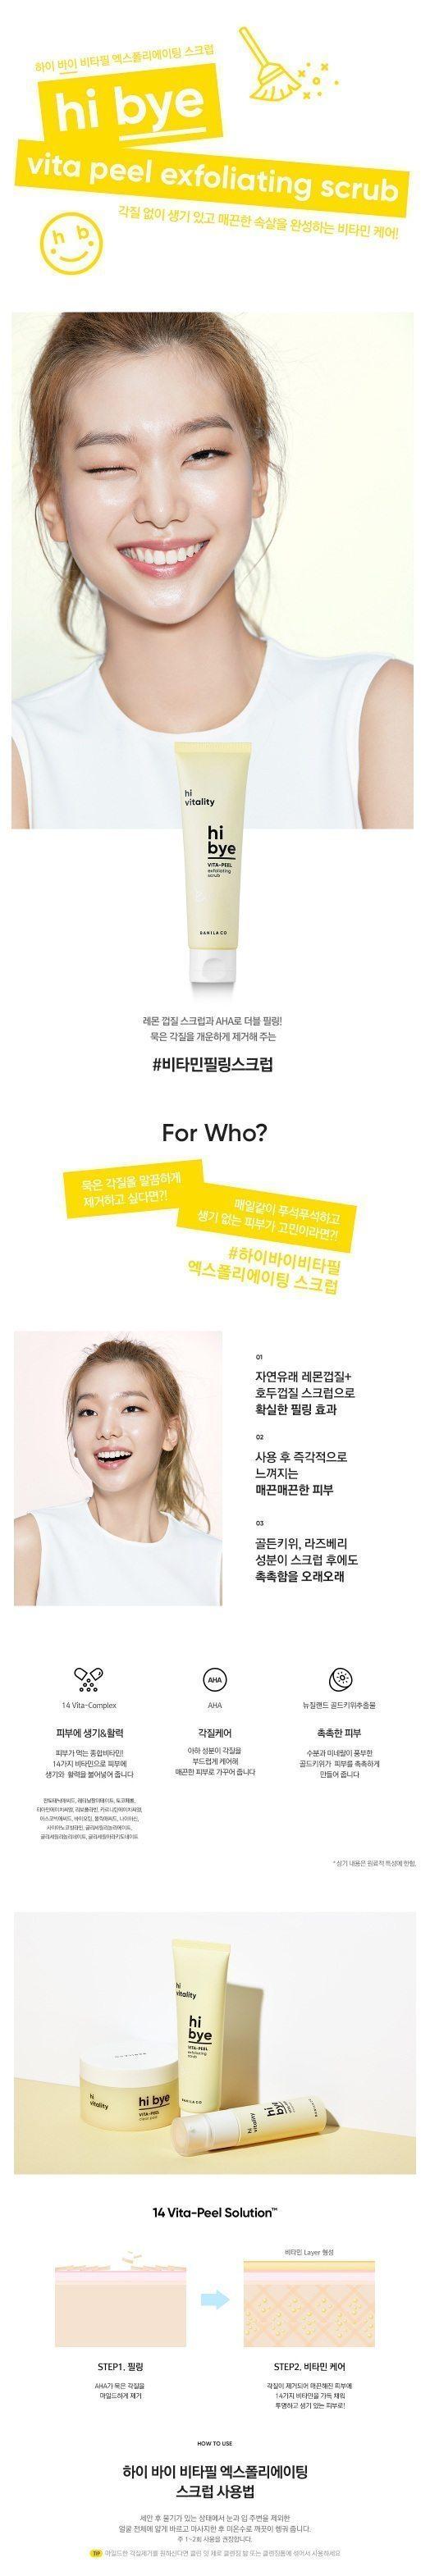 Banila Co Hi Bye Vita Peel Exfoliating Scrub korean skincare product online shop malaysia italy germany1